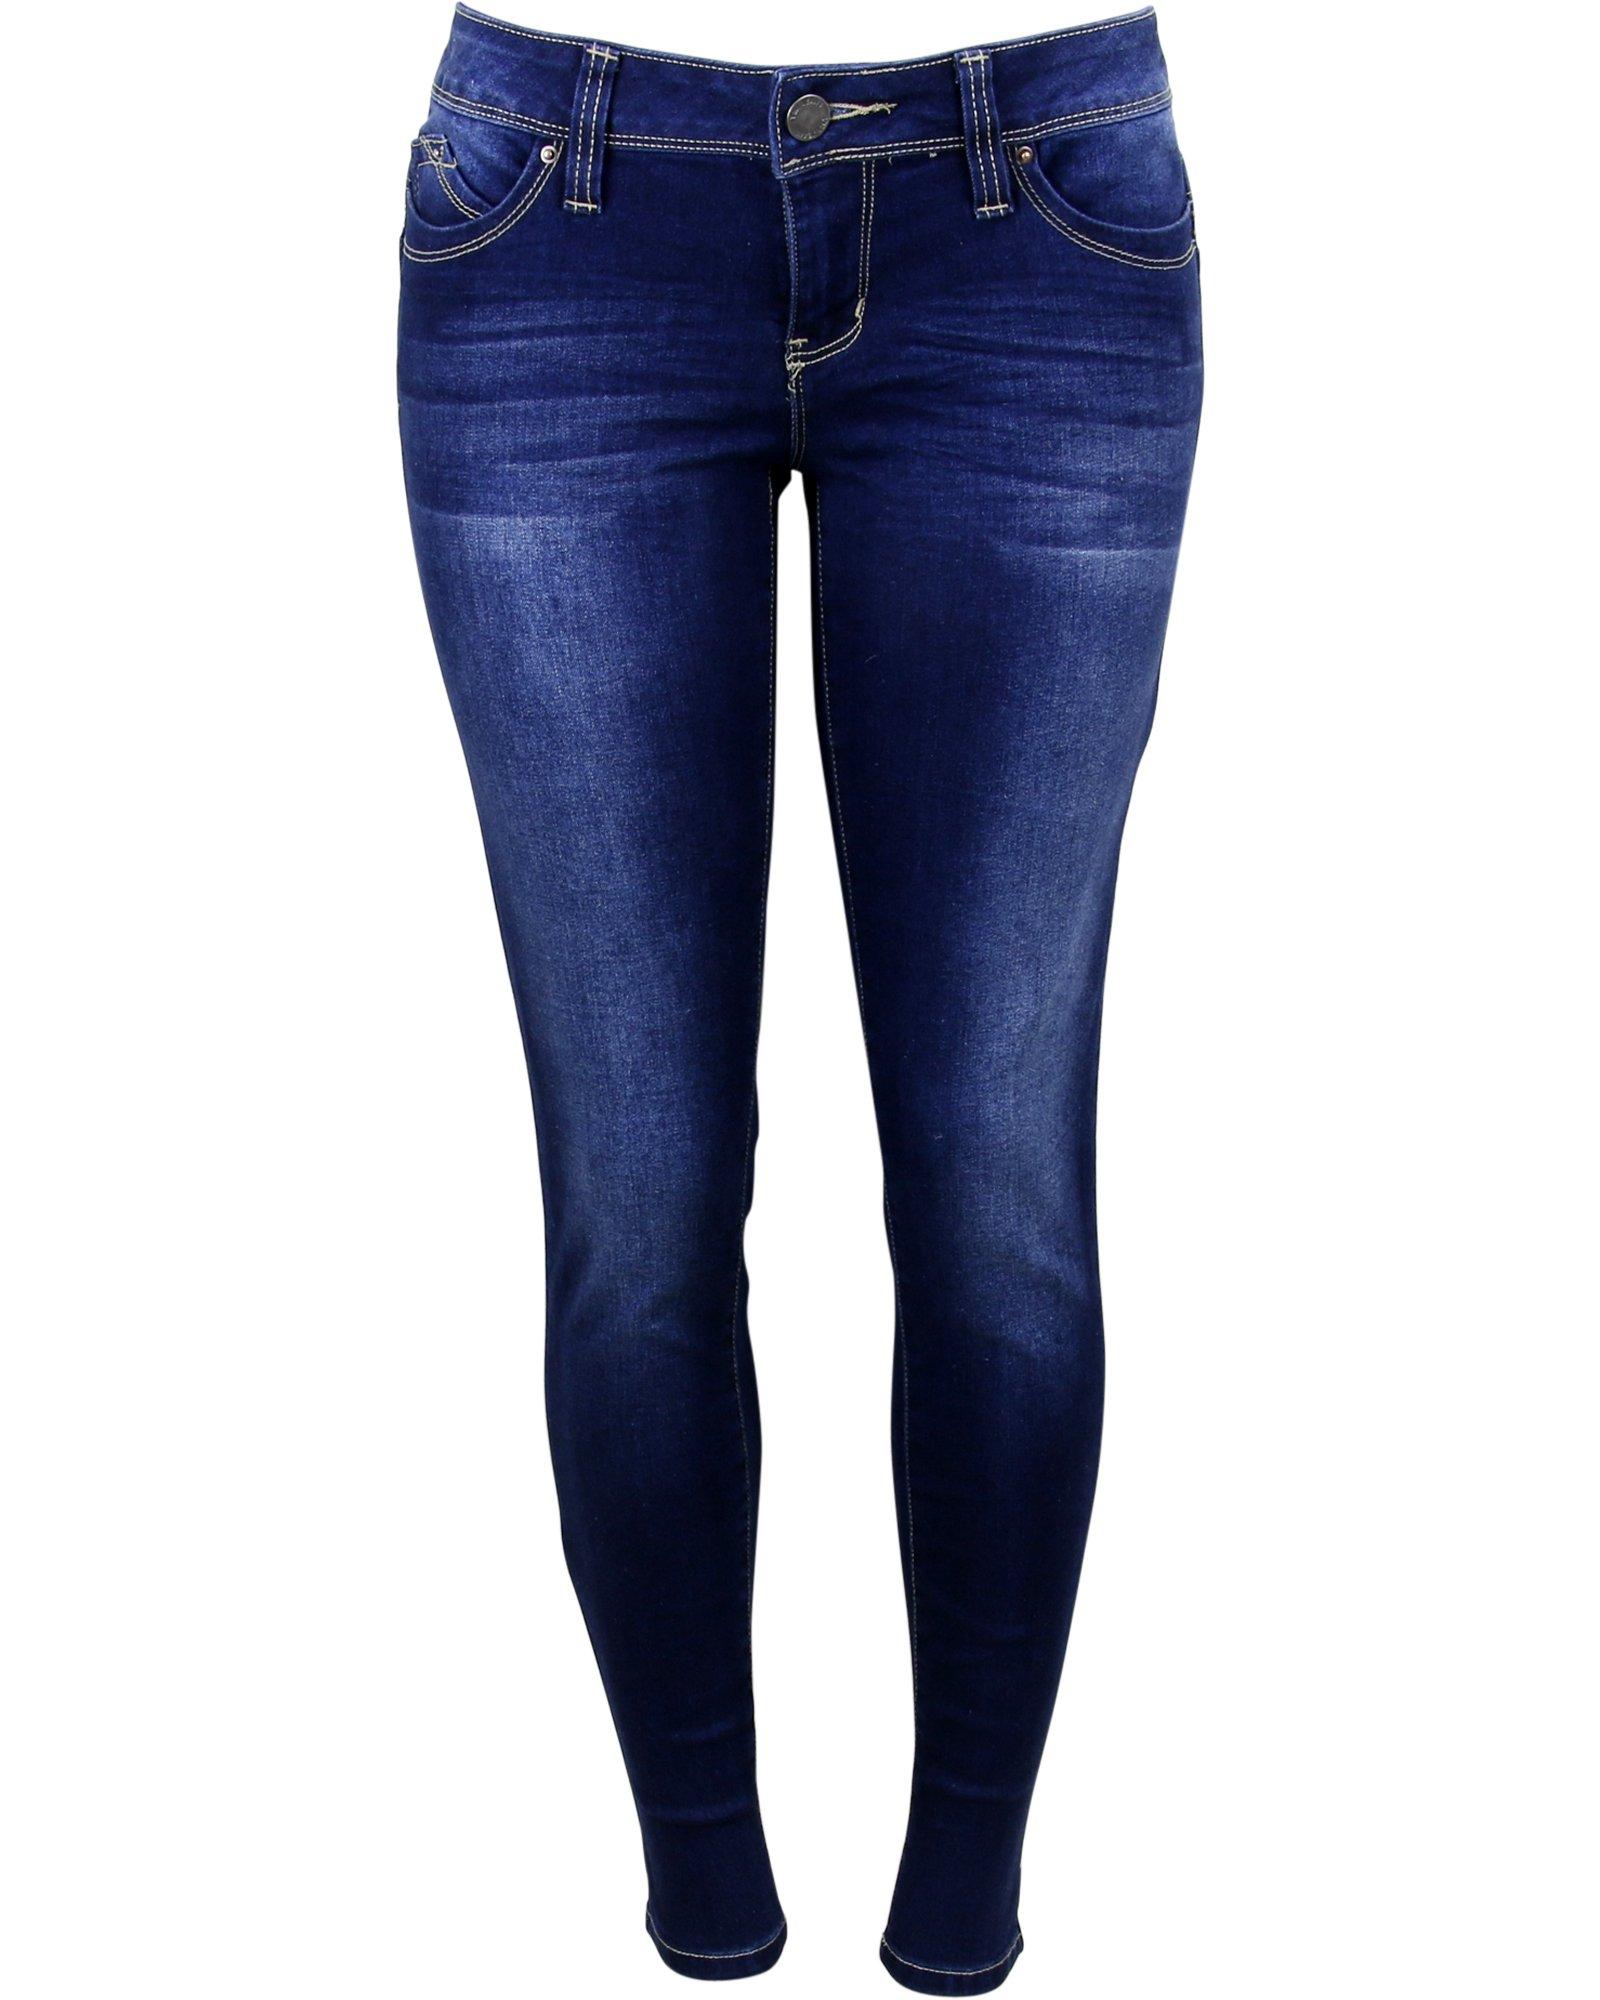 Ymi Women's Betta Butt Jeans,Blue/Blue,13